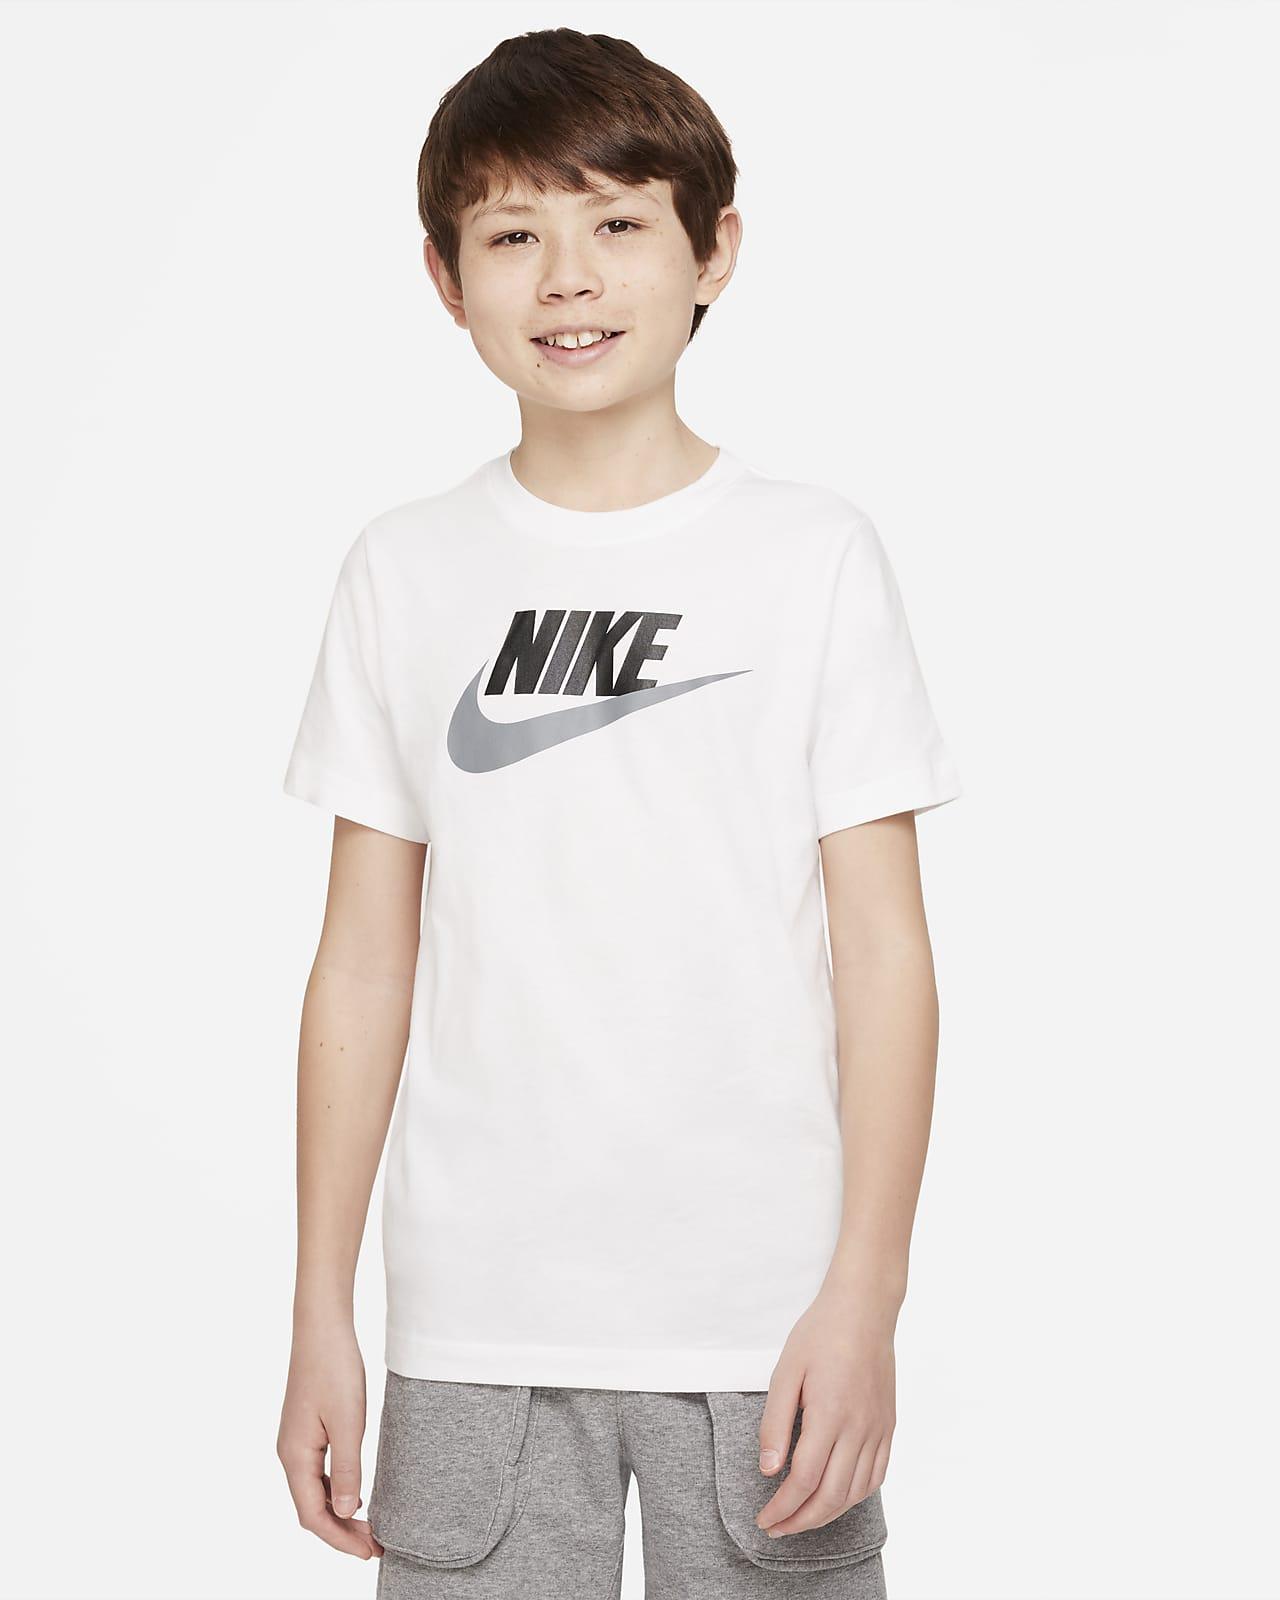 Nike Sportswear Camiseta de algodón - Niño/a